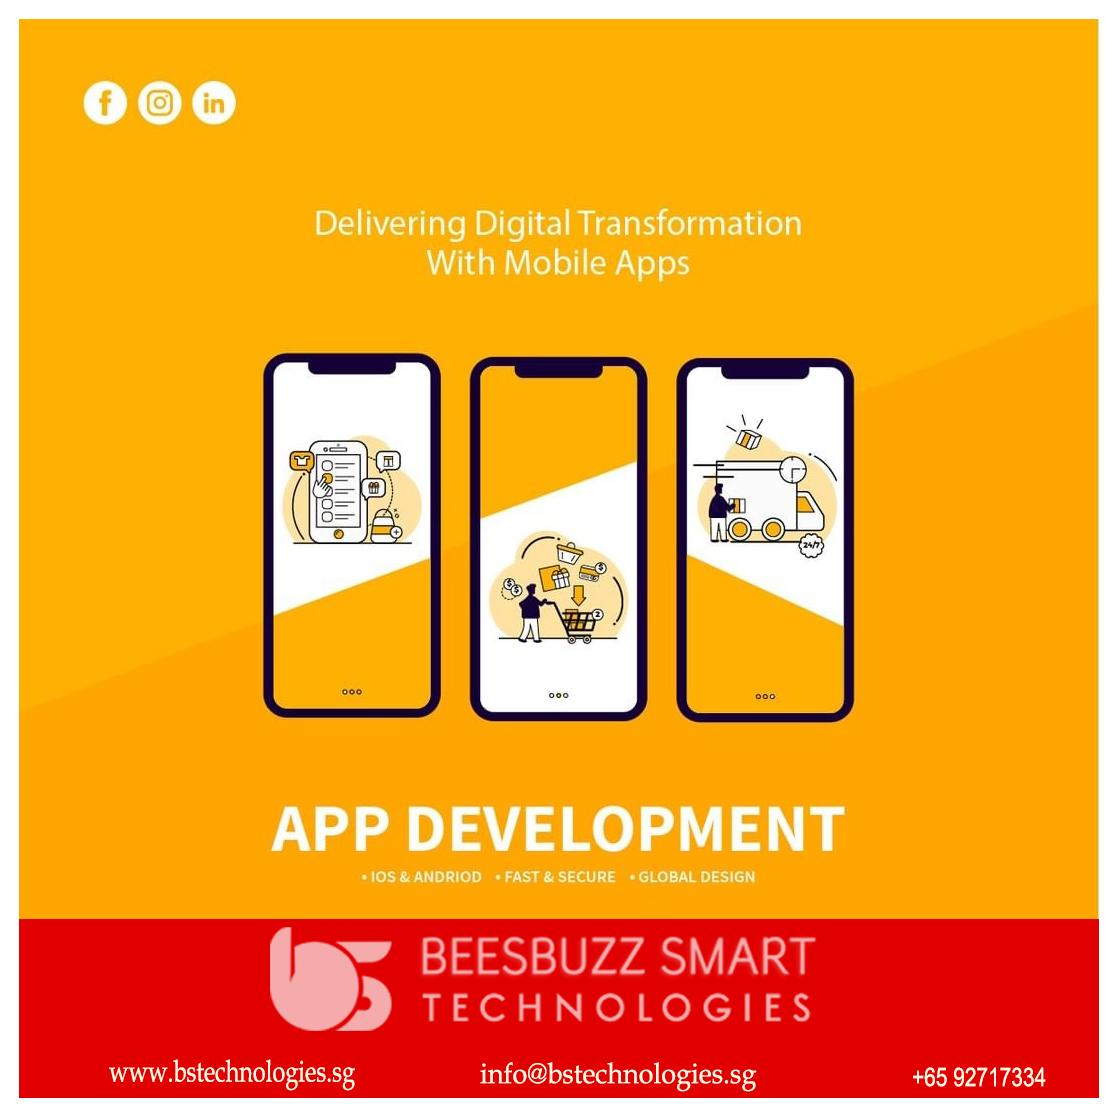 𝗔𝗻𝗱𝗿𝗼𝗶𝗱 𝗔𝗽𝗽 𝗗𝗲𝘃𝗲𝗹𝗼𝗽𝗺𝗲𝗻𝘁 | 𝗪𝗲𝗯𝘀𝗶𝘁𝗲 𝗗𝗲𝘃𝗲𝗹𝗼𝗽𝗺𝗲𝗻𝘁 | #ERP 𝗦𝗼𝗹𝘂𝘁𝗶𝗼𝗻 | 𝗦𝗼𝗳𝘁𝘄𝗮𝗿𝗲 𝗦𝗼𝗹𝘂𝘁𝗶𝗼𝗻𝘀. #Websitedesign #websitedevelopment #Economywebsite  #mobileapplicationcompanyinsingapore #erpsupport #desktopapplication https://t.co/pDLt4cGb63